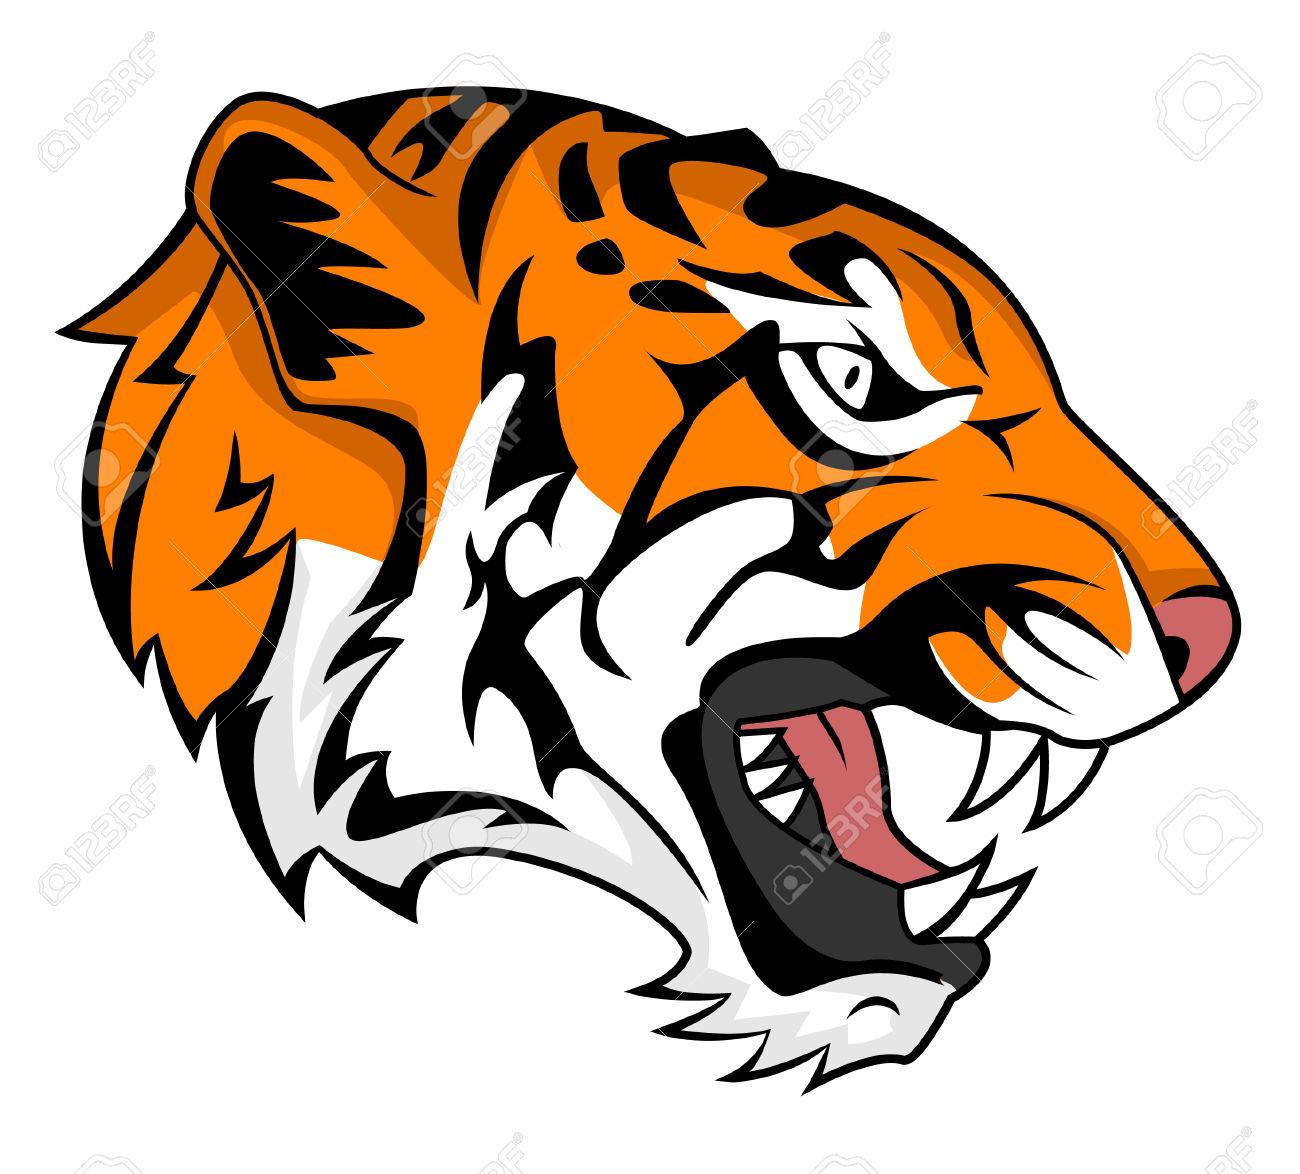 Roaring tiger head clipart svg freeuse download Tiger Head Clipart | Free download best Tiger Head Clipart ... svg freeuse download